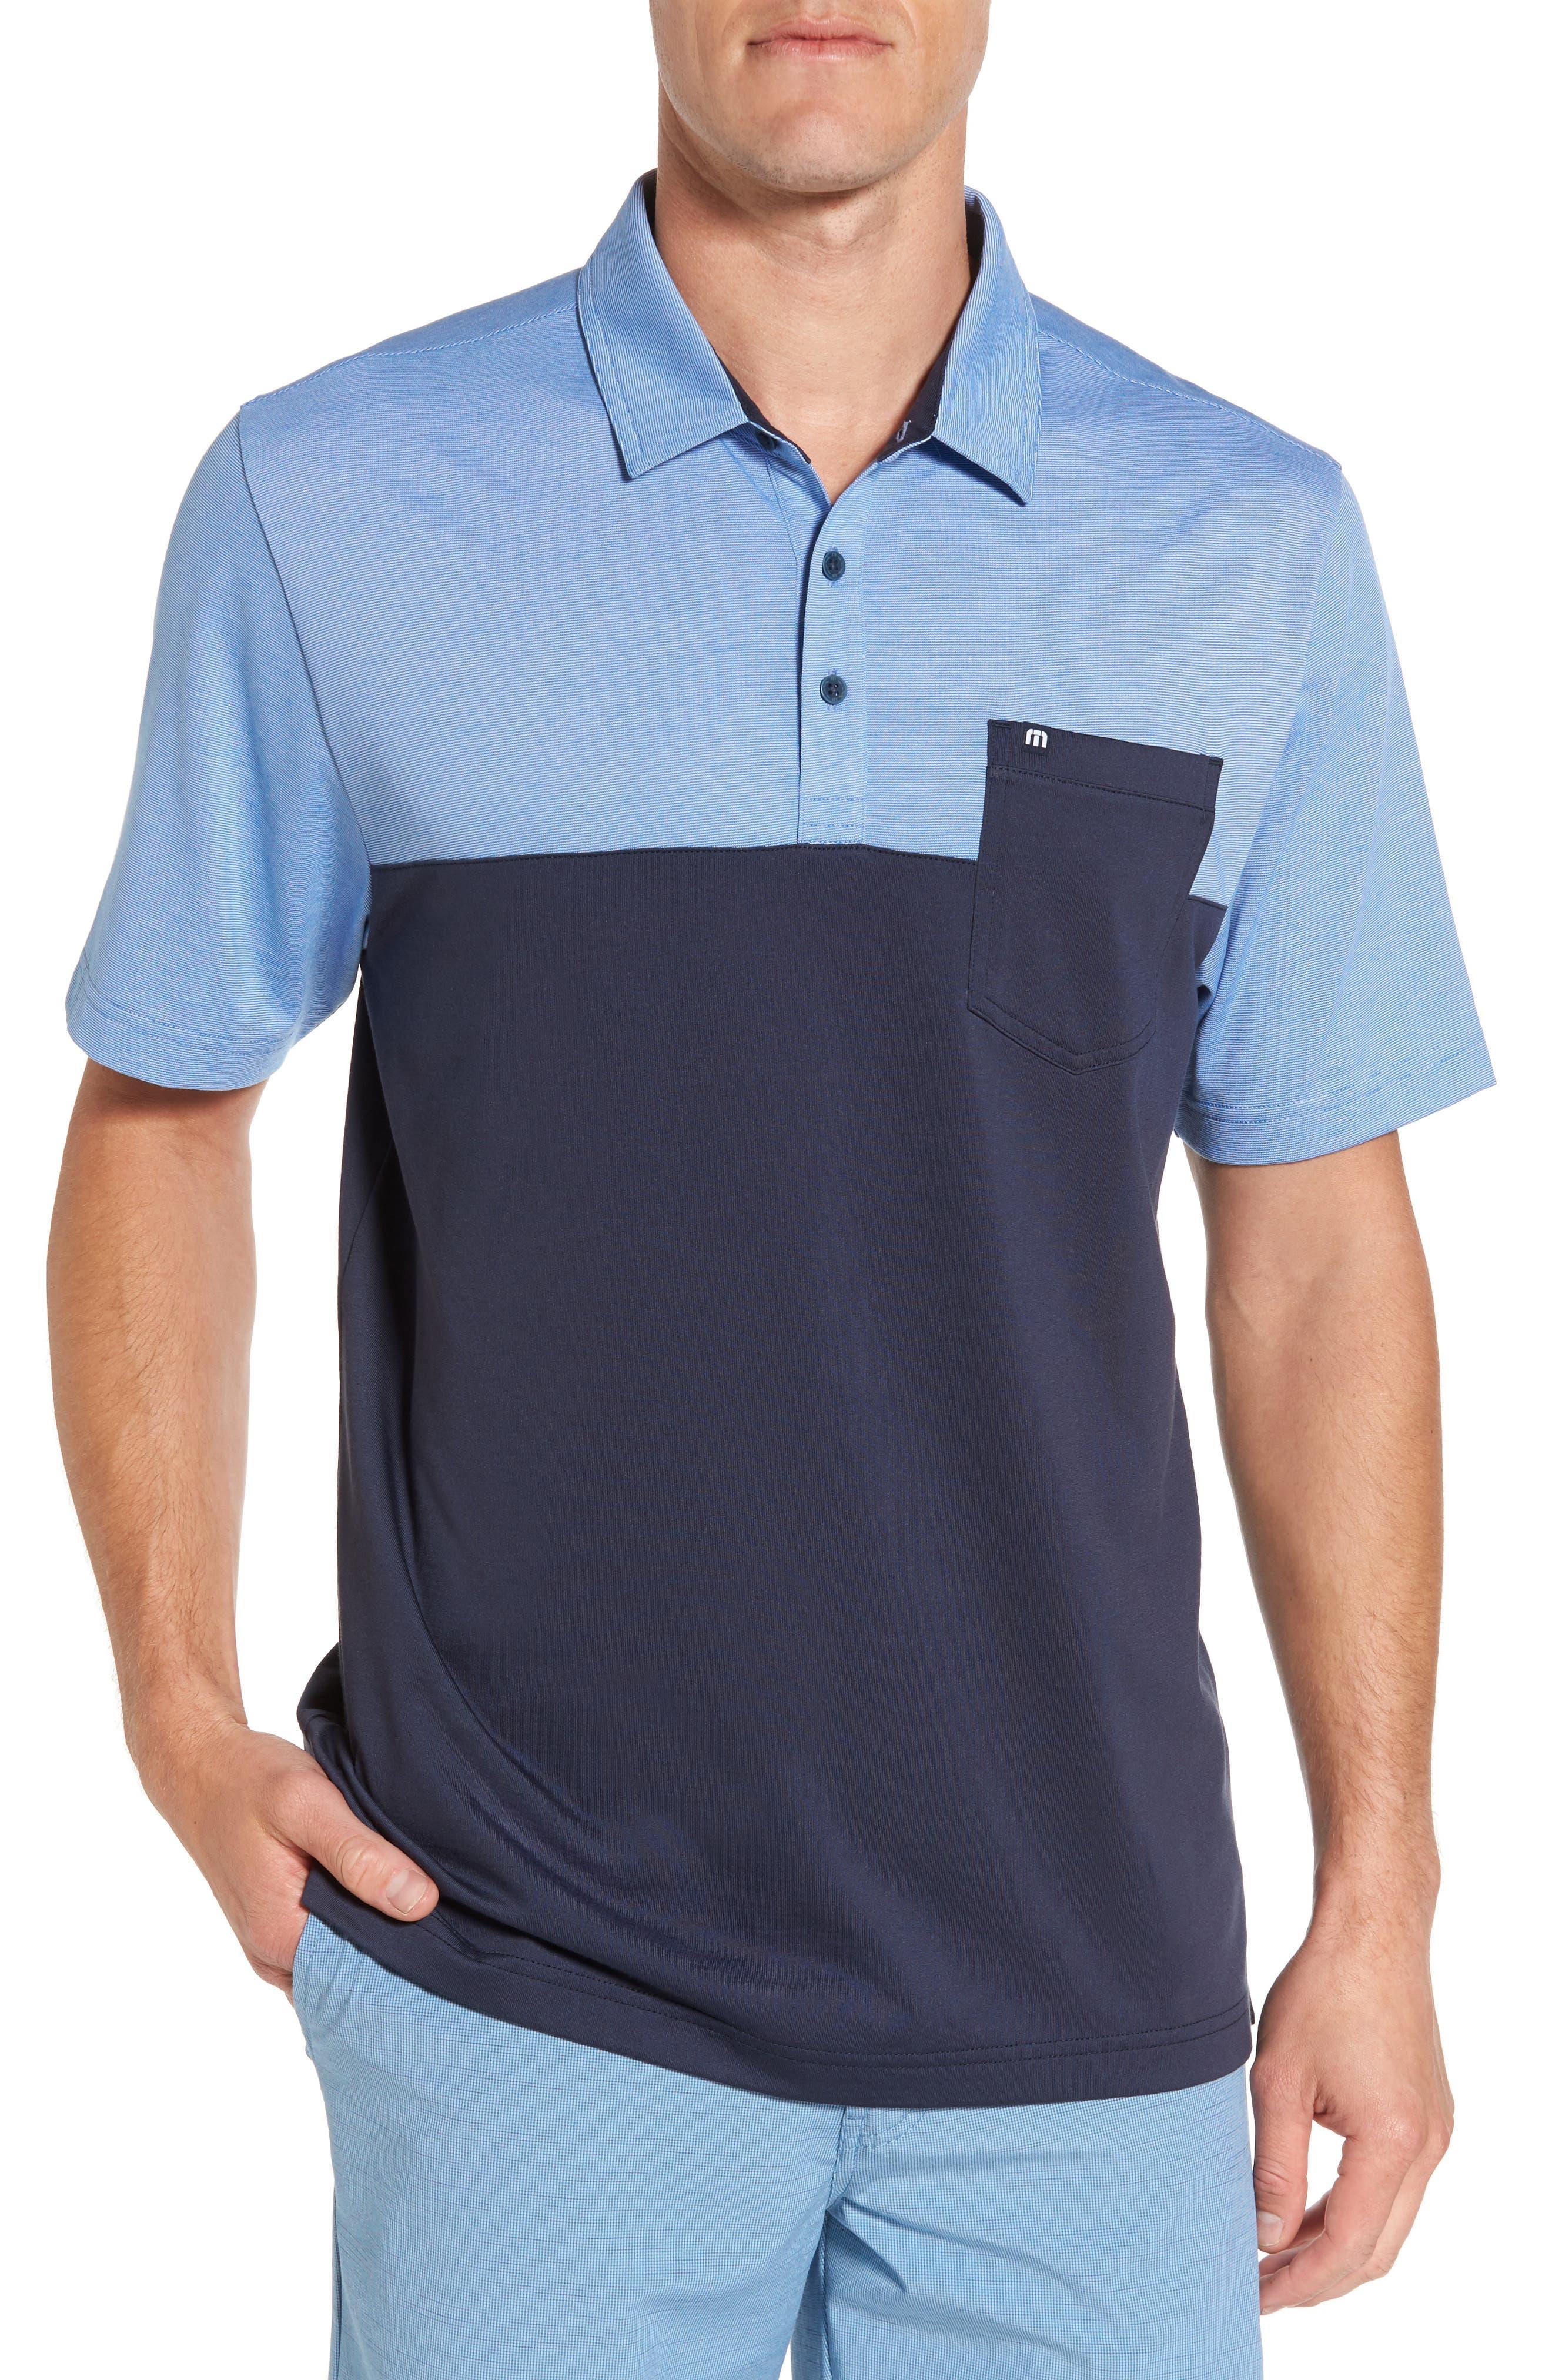 TRAVIS MATHEW The Lute Jersey Polo